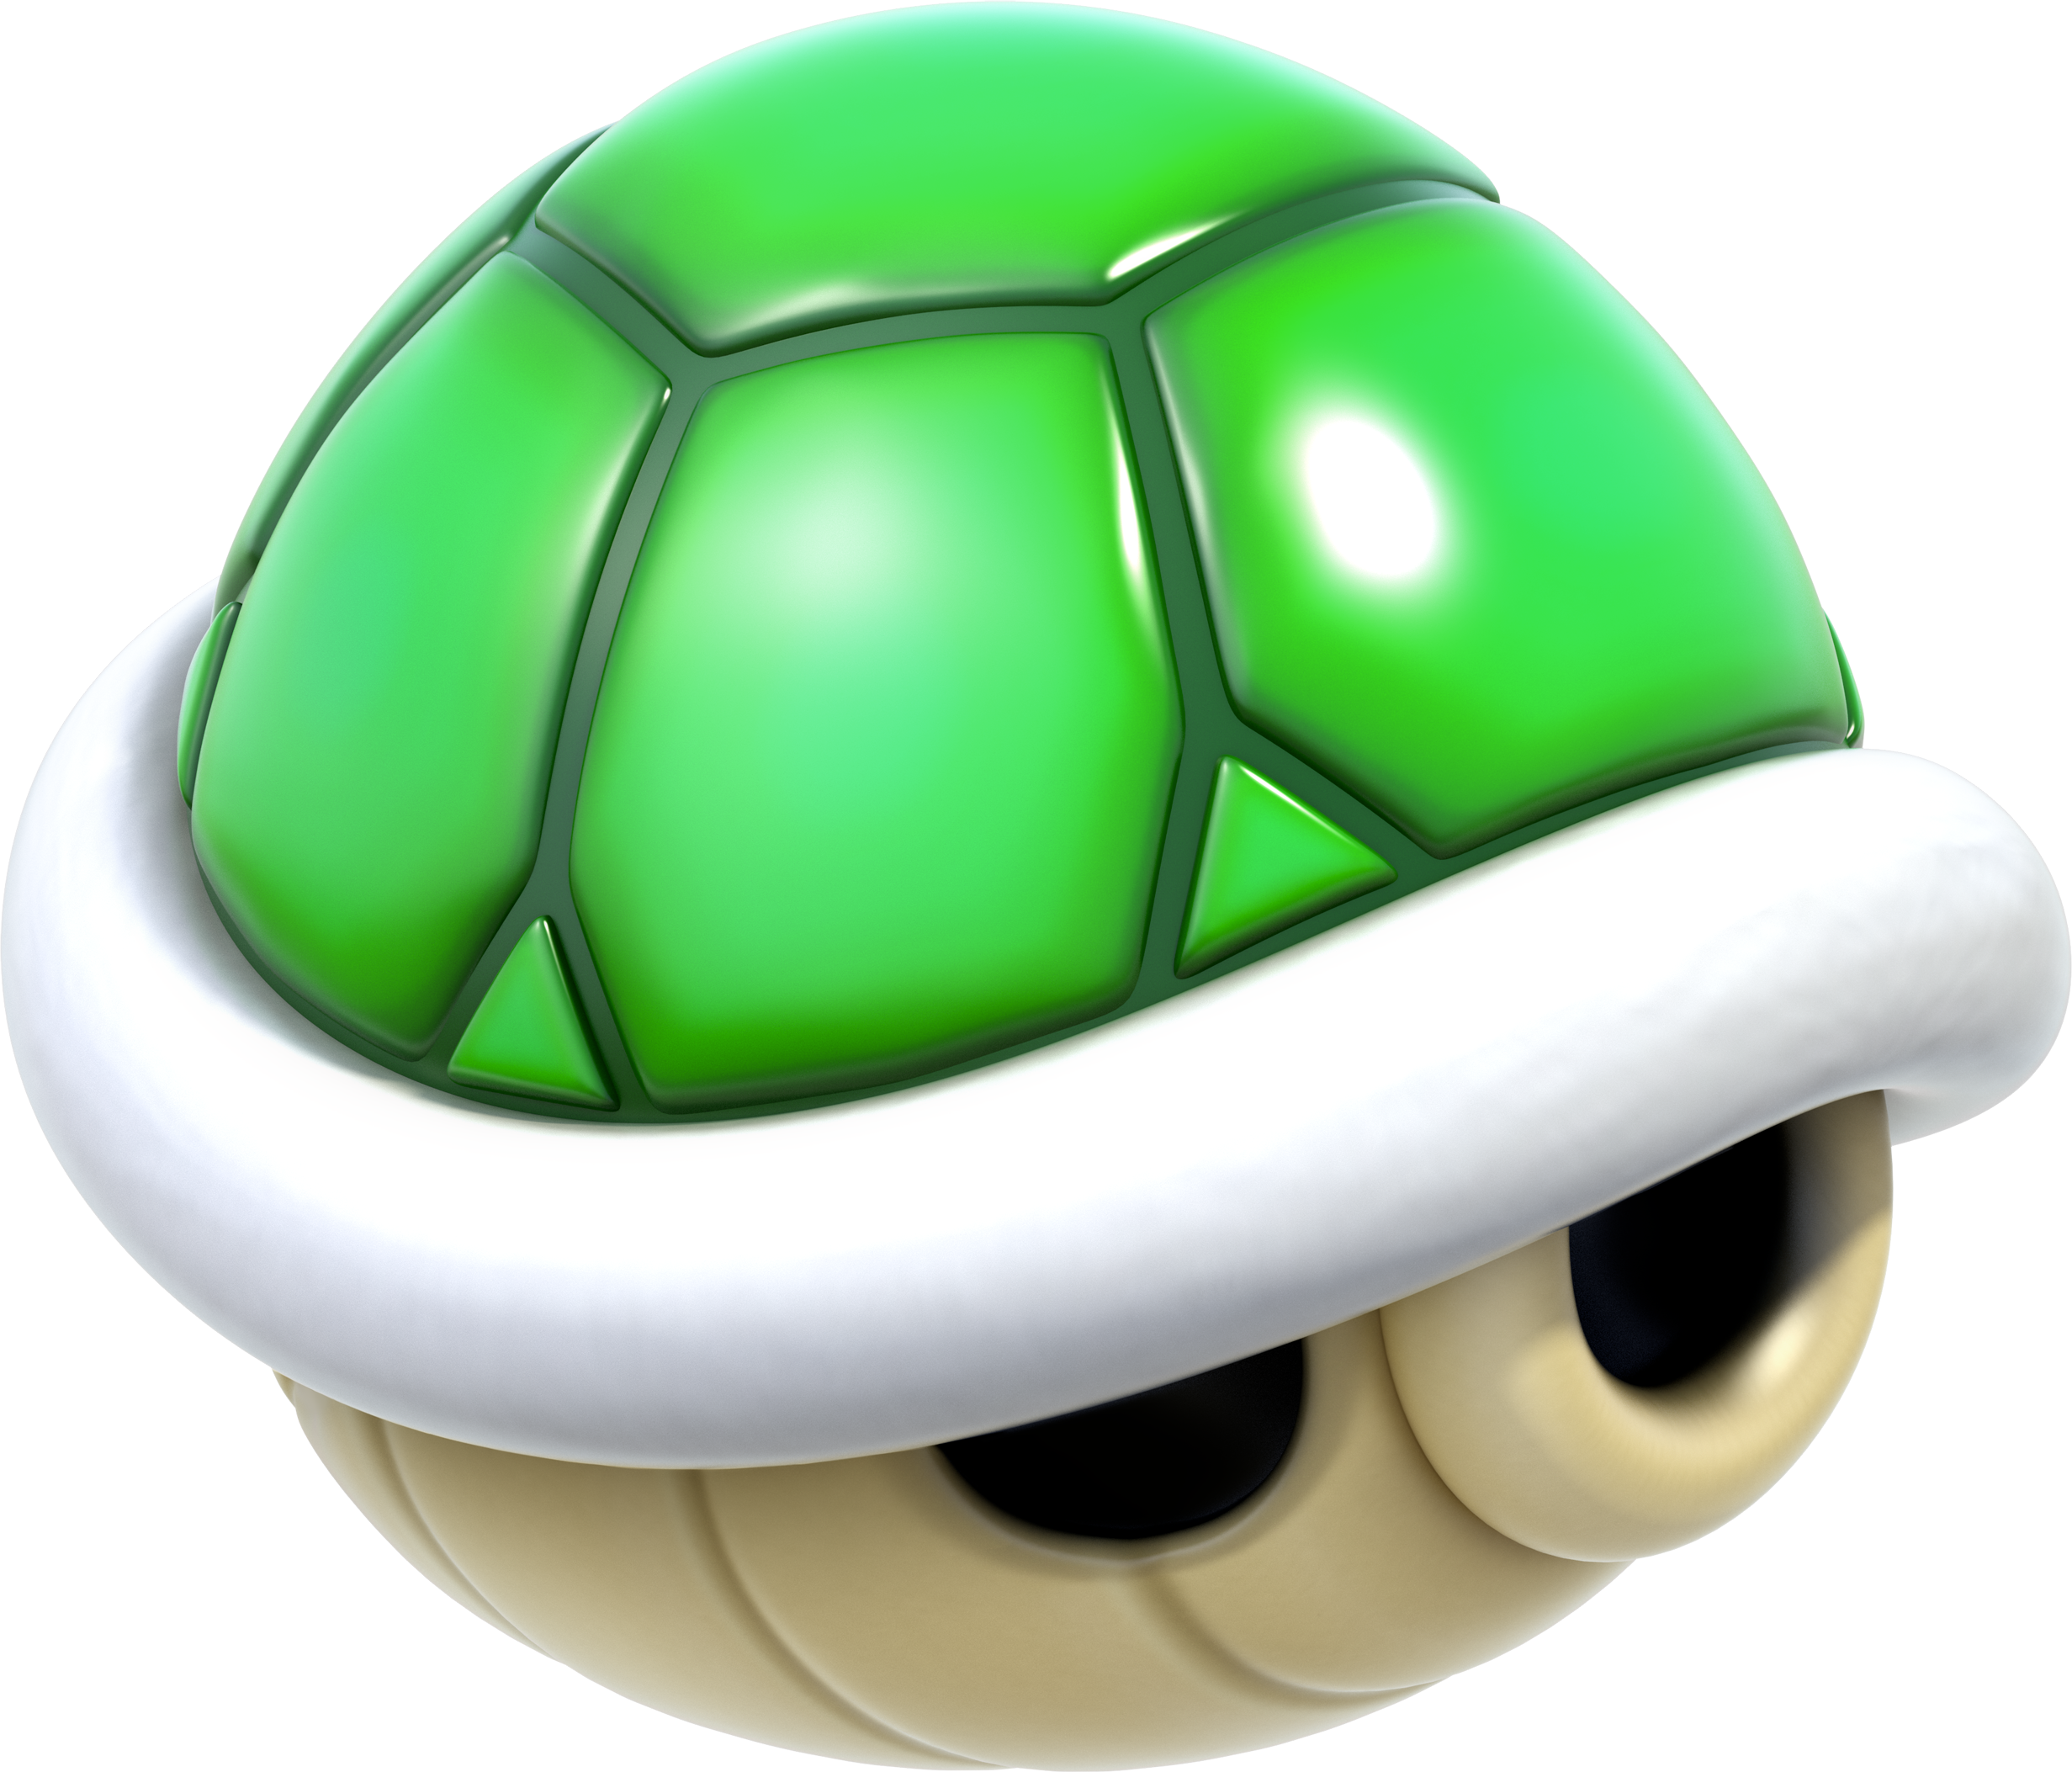 Image Result For Red Turtle Shell Mario Super Mario 3d Shell Artwork Super Mario